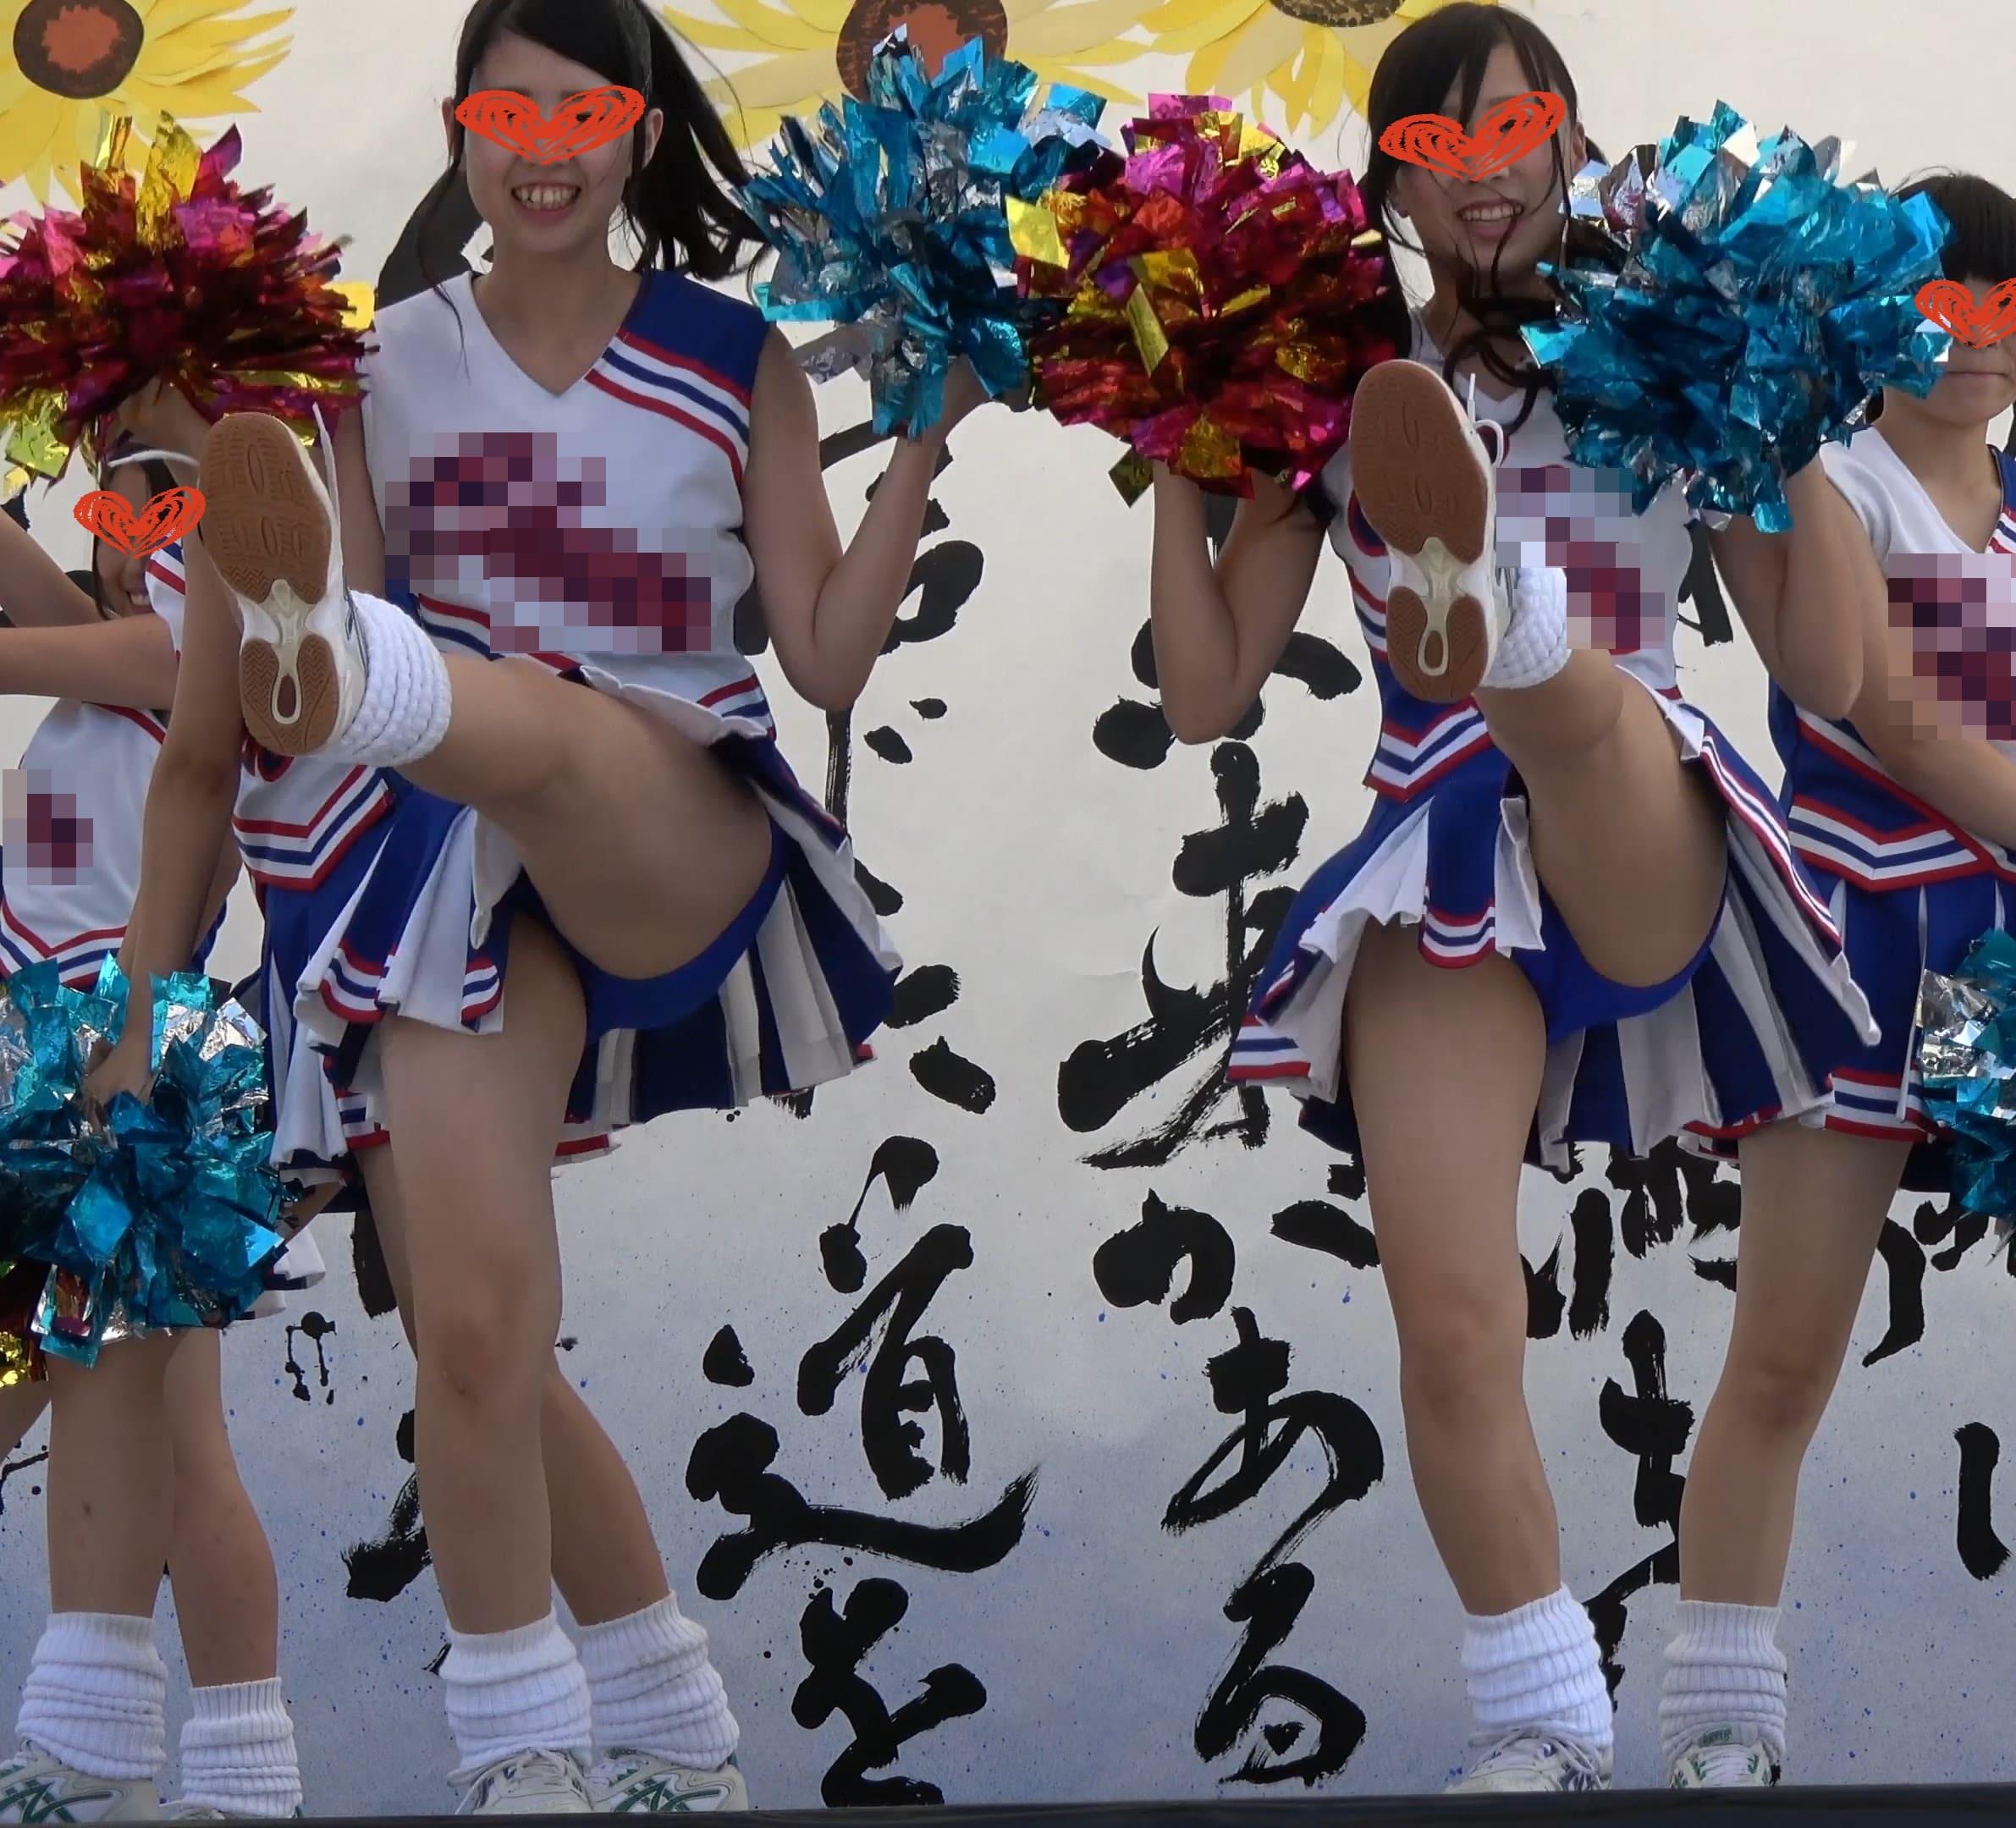 【4K高画質】チア7 無名青アンスコチームなのに可愛すぎ!全員アイドル並奇跡の世代!Part.2【超Kの者】画像つき詳細レビュー